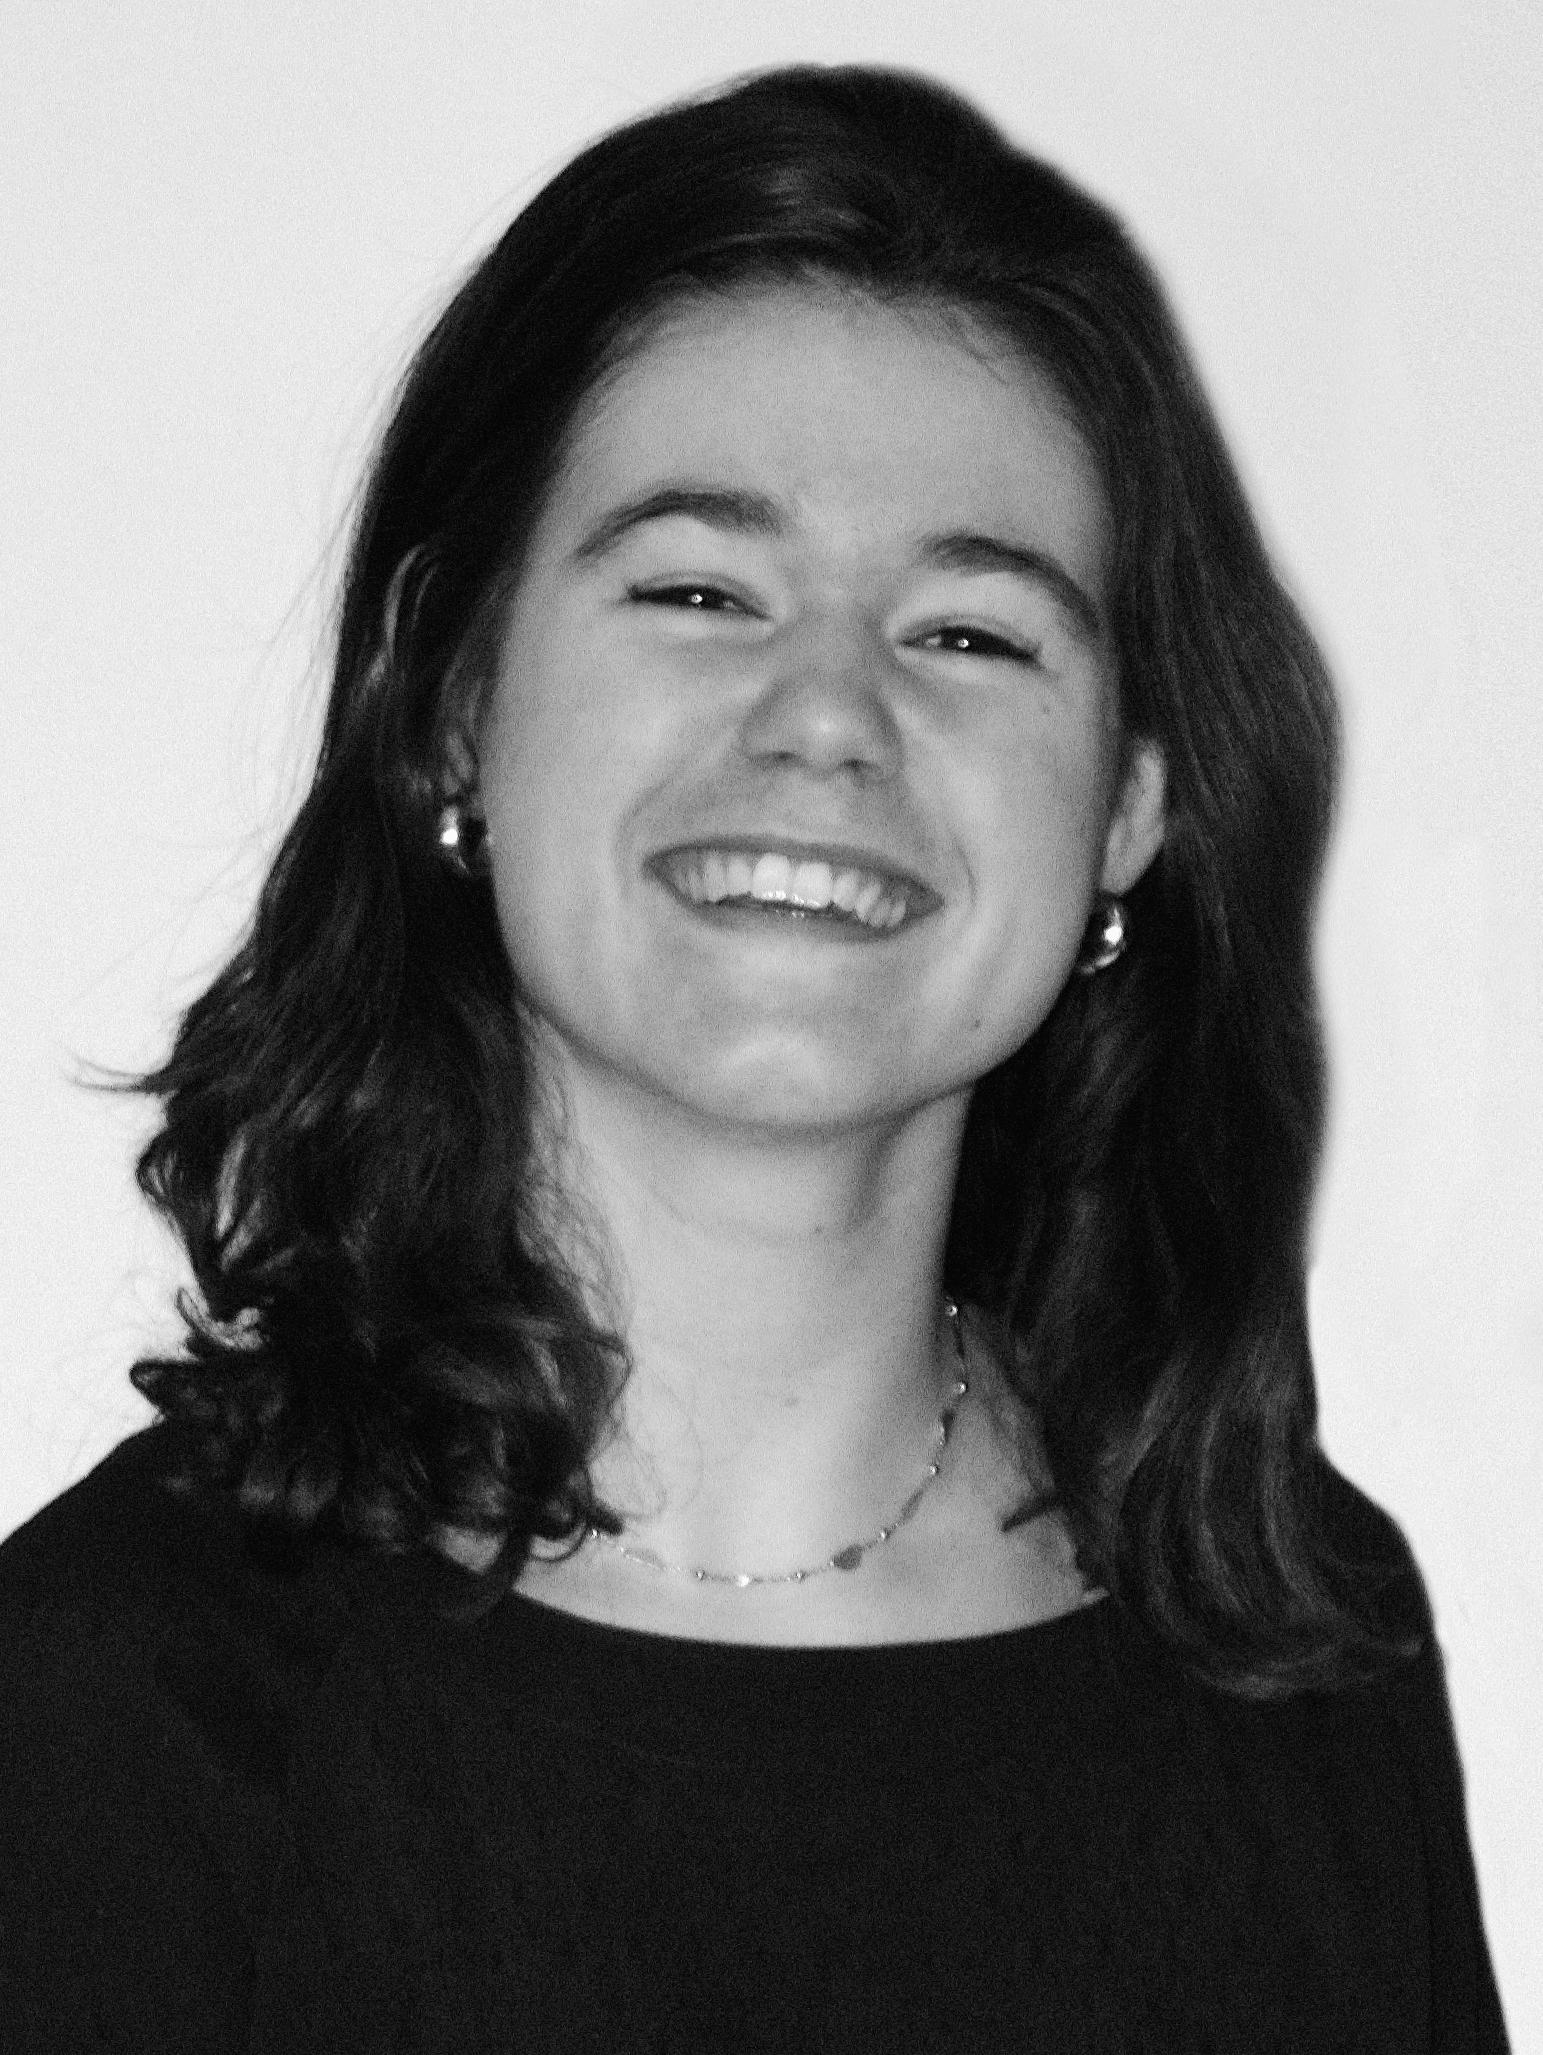 Charlotte Boin (NL)